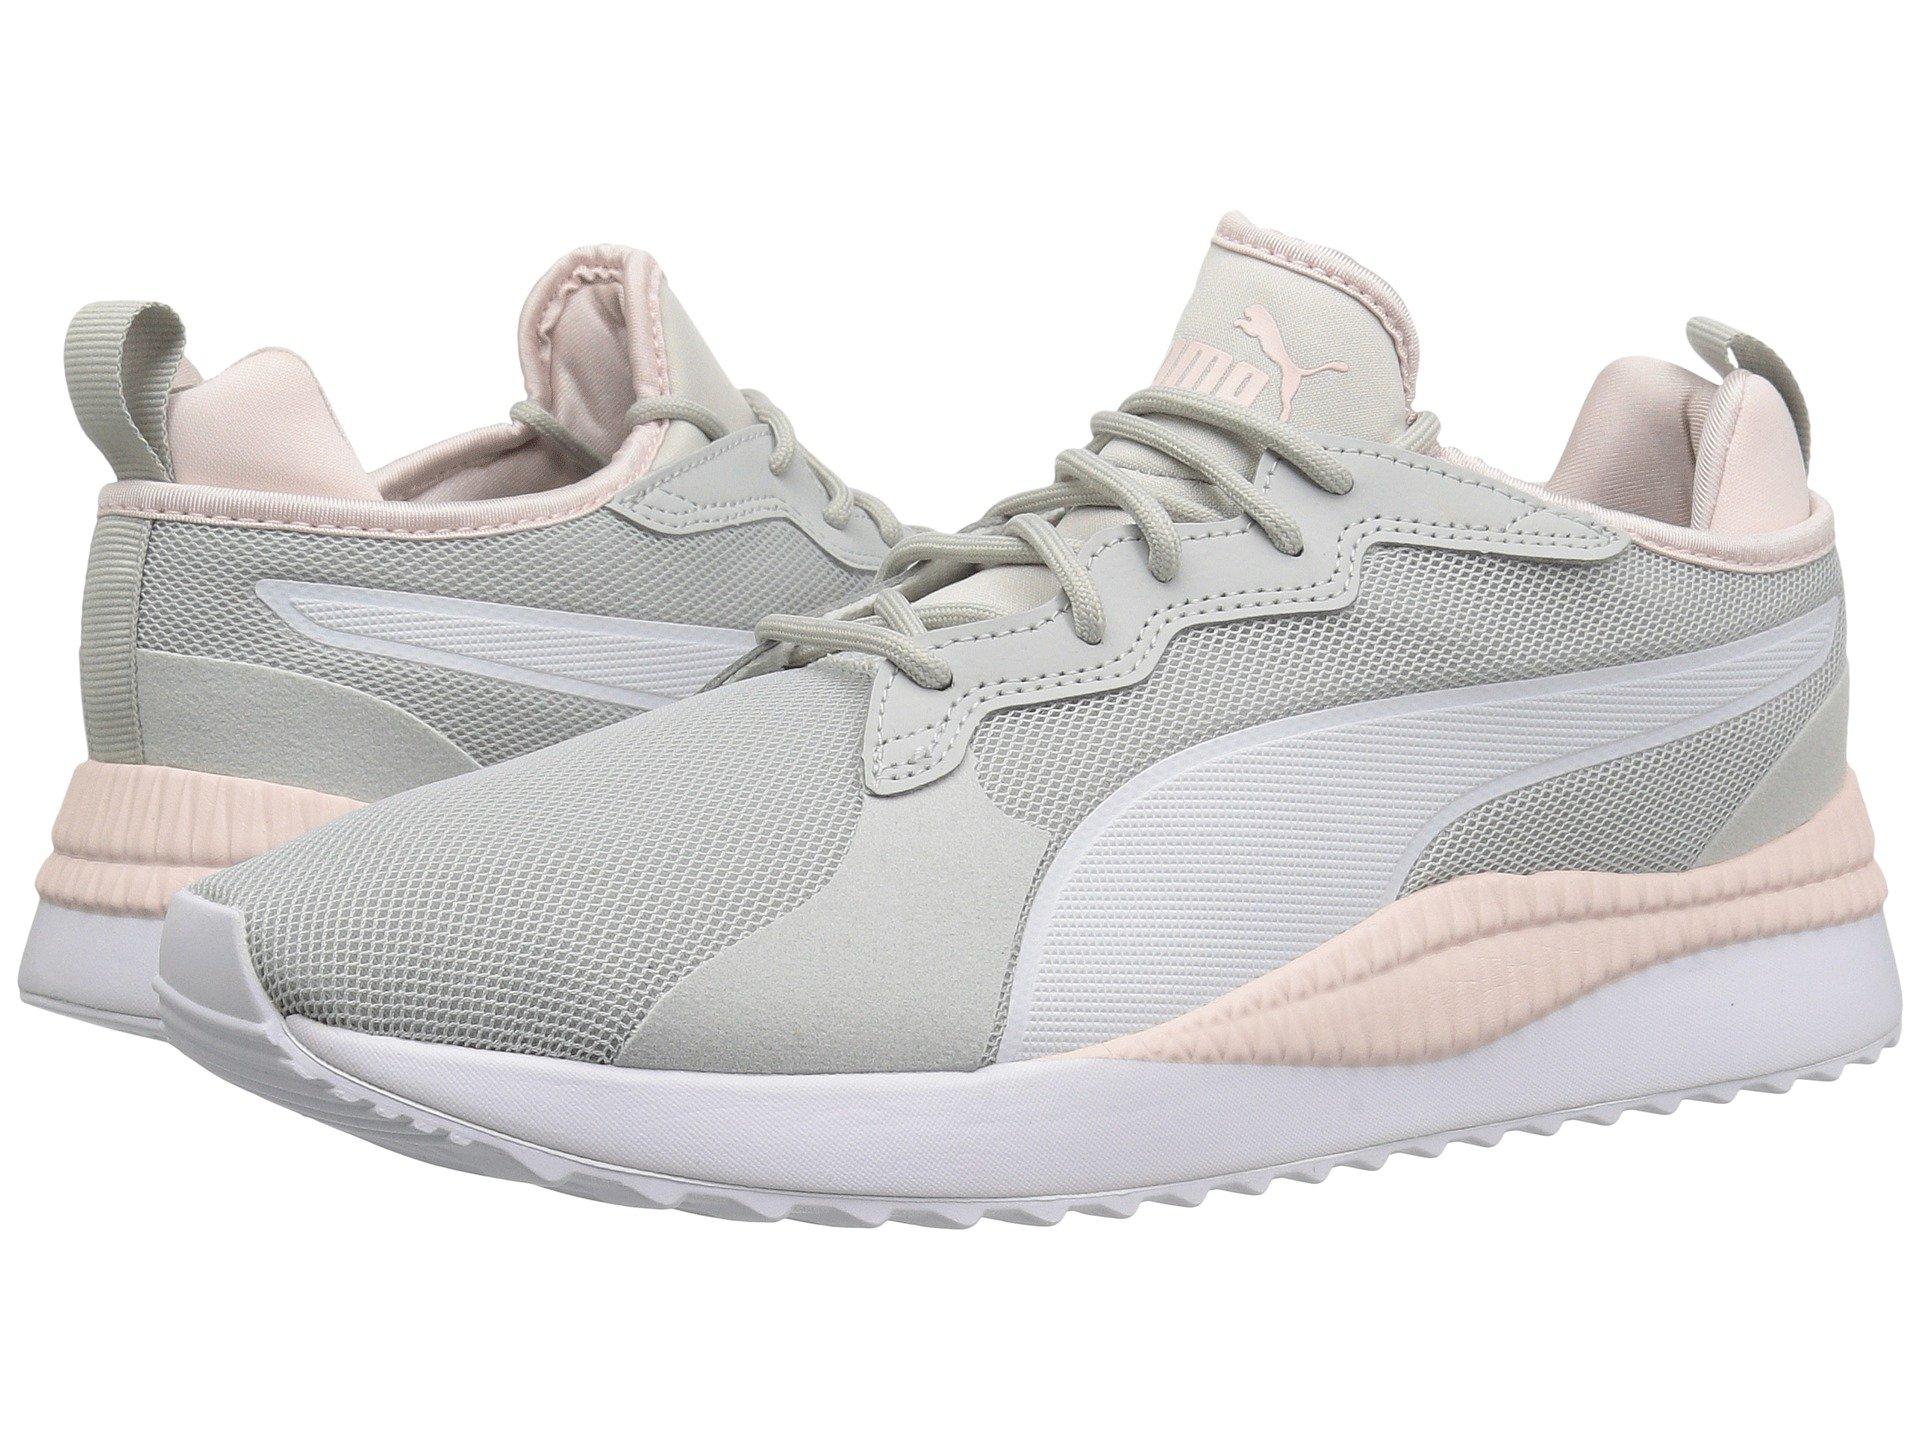 PACER NEXT - Sneaker low - quarry-gray violet-asphalt Verkauf Niedrig Kosten Verkauf Niedriger Versand Outlet Rabatt Neuankömmling 100% Authentisch 5hgIL